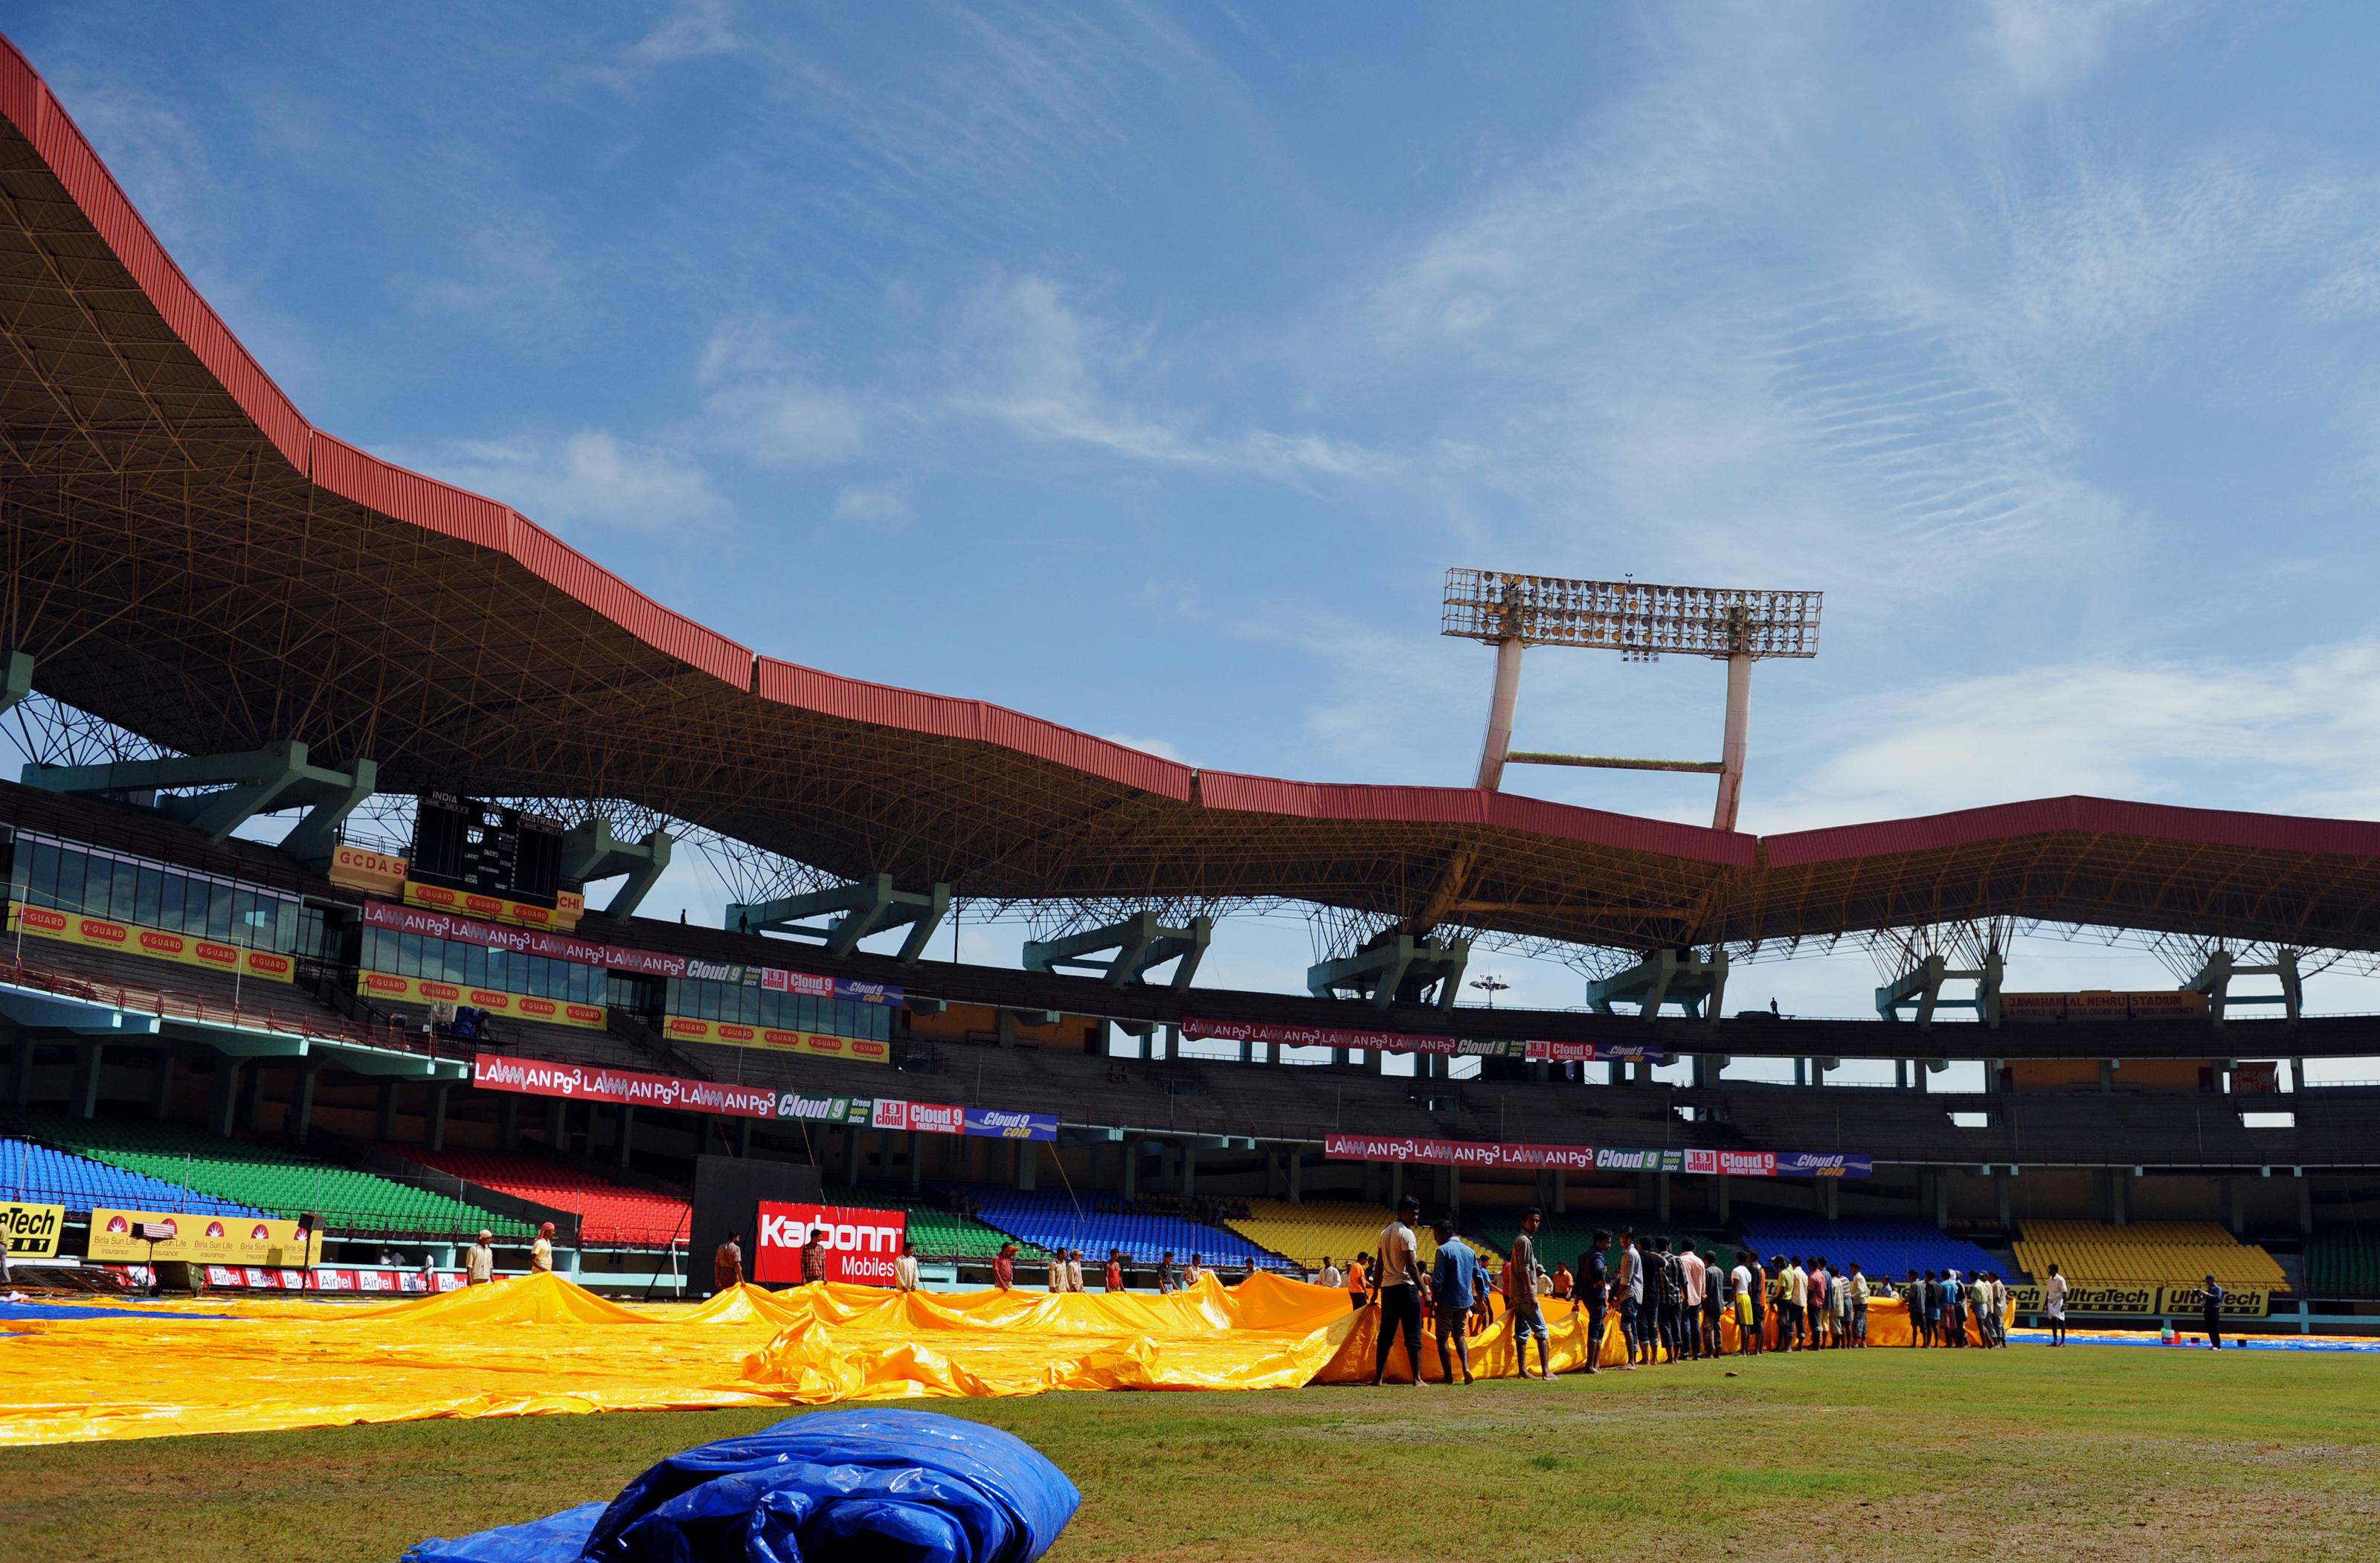 Kerala Blasters CEO Varun Tripuraneni - 'Dream is to have our own stadium'